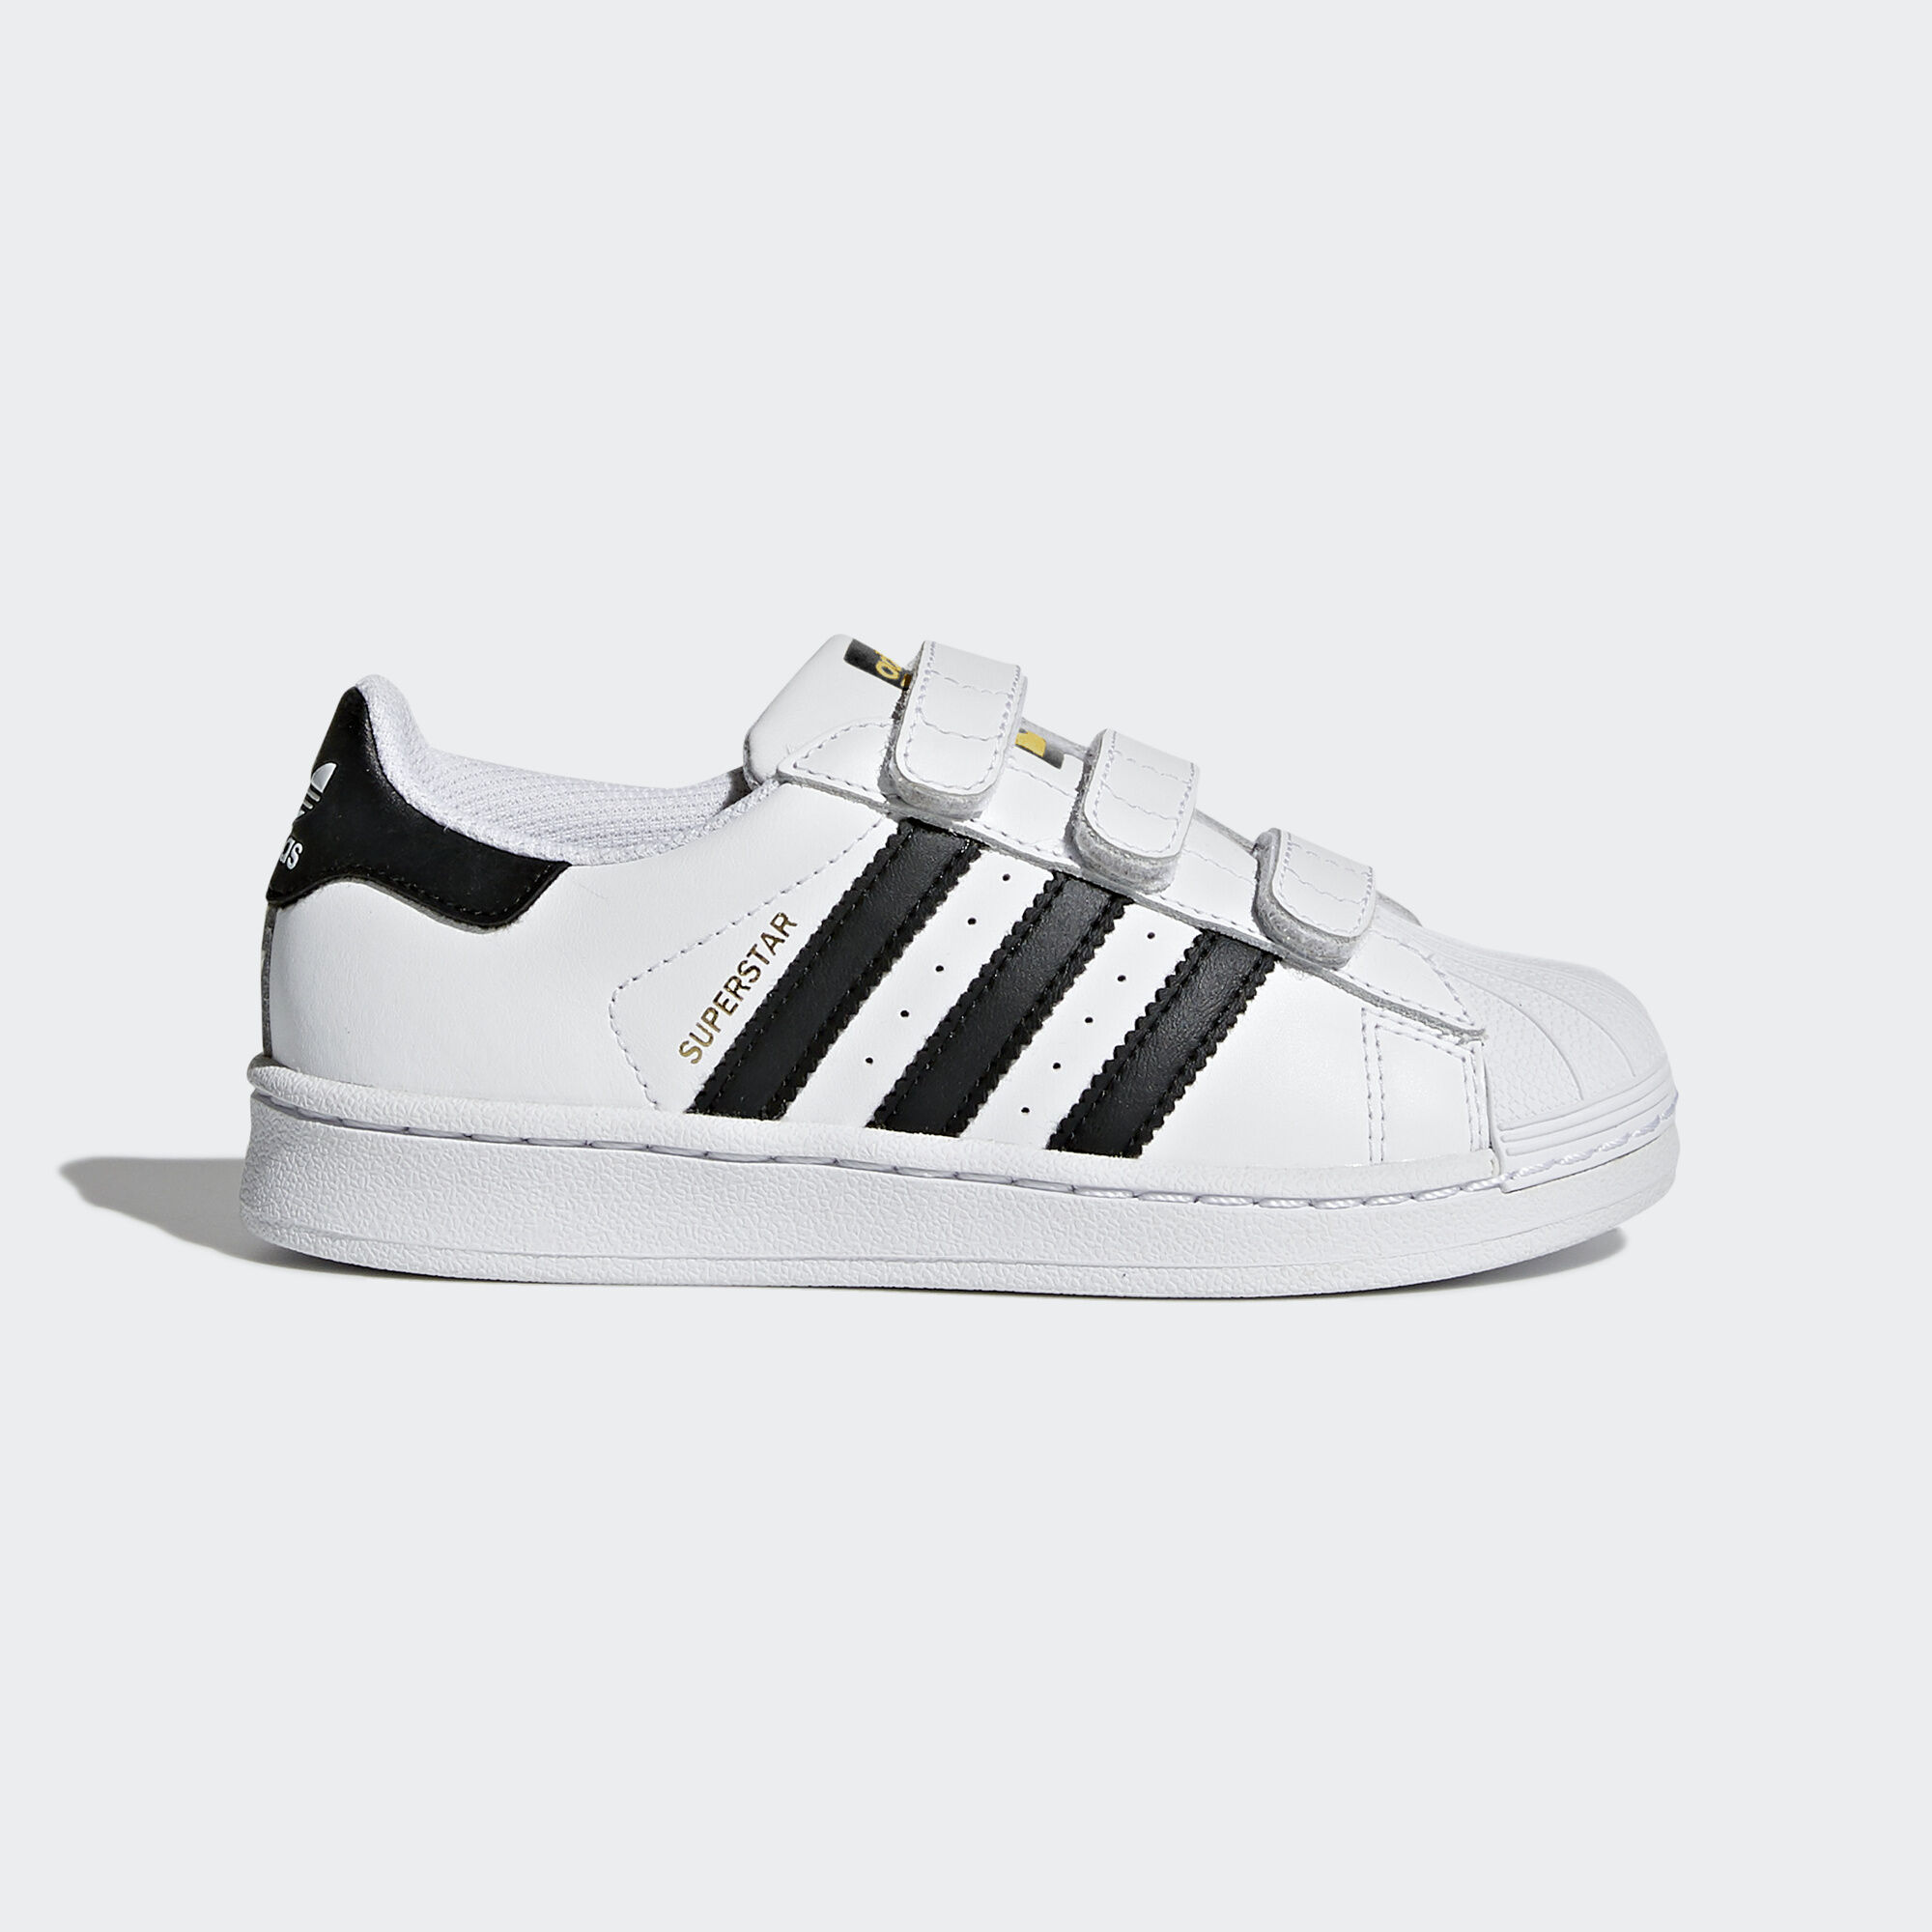 Schuhe Kinder c3 F bcr Adidas zSUpLMqGV